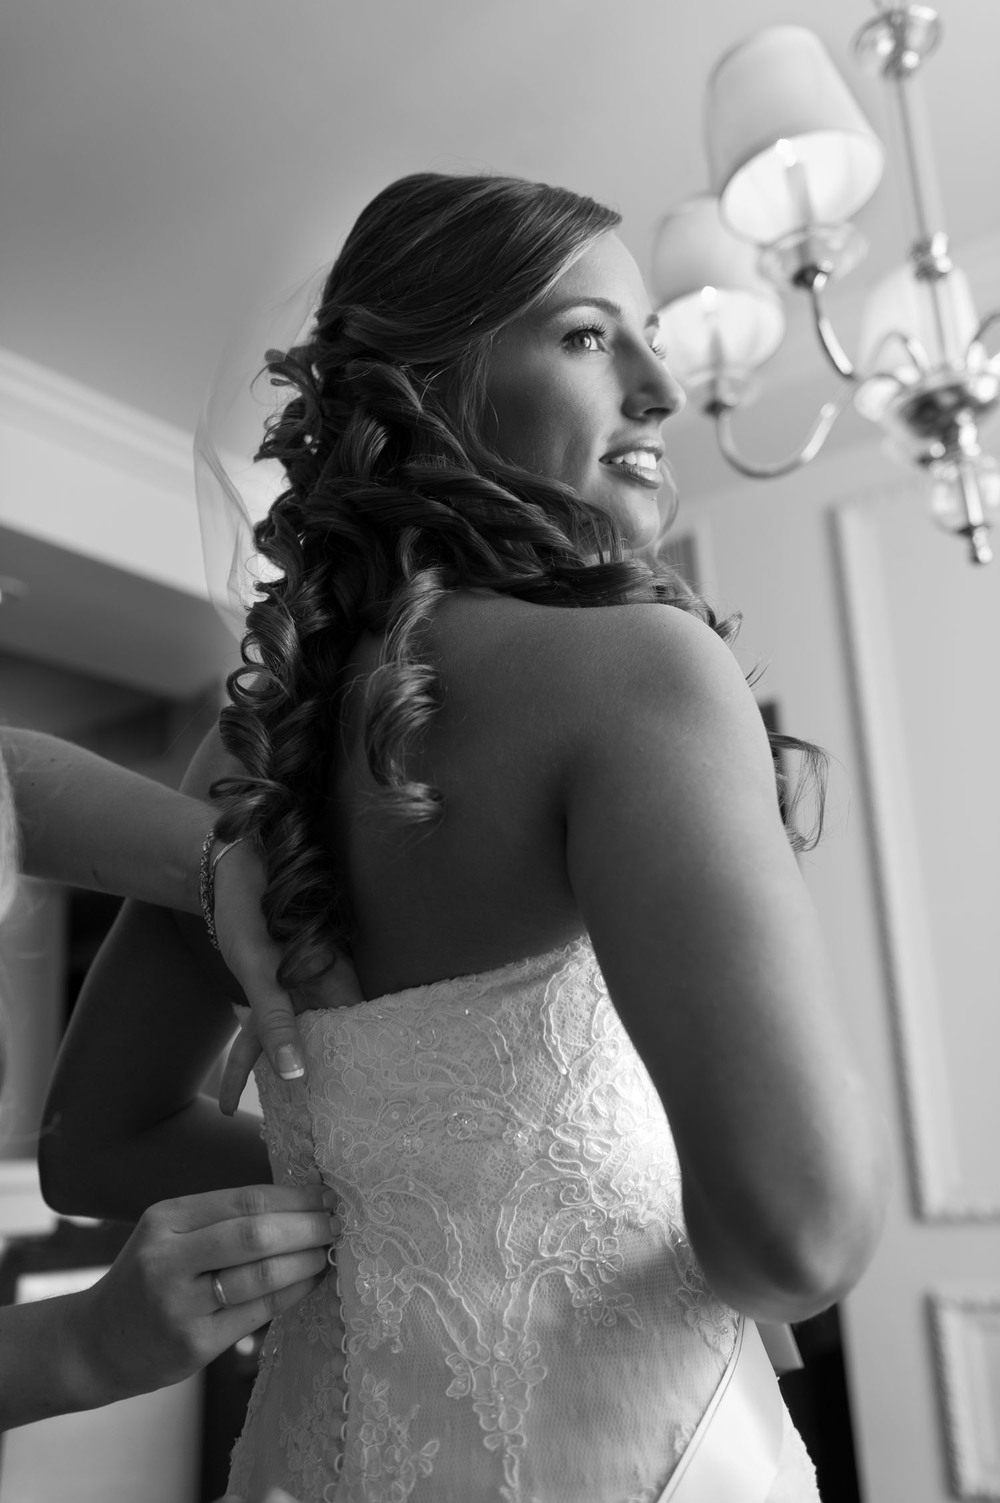 stewart_bertrand_wedding_photography_mawedblogwed-1027.jpg